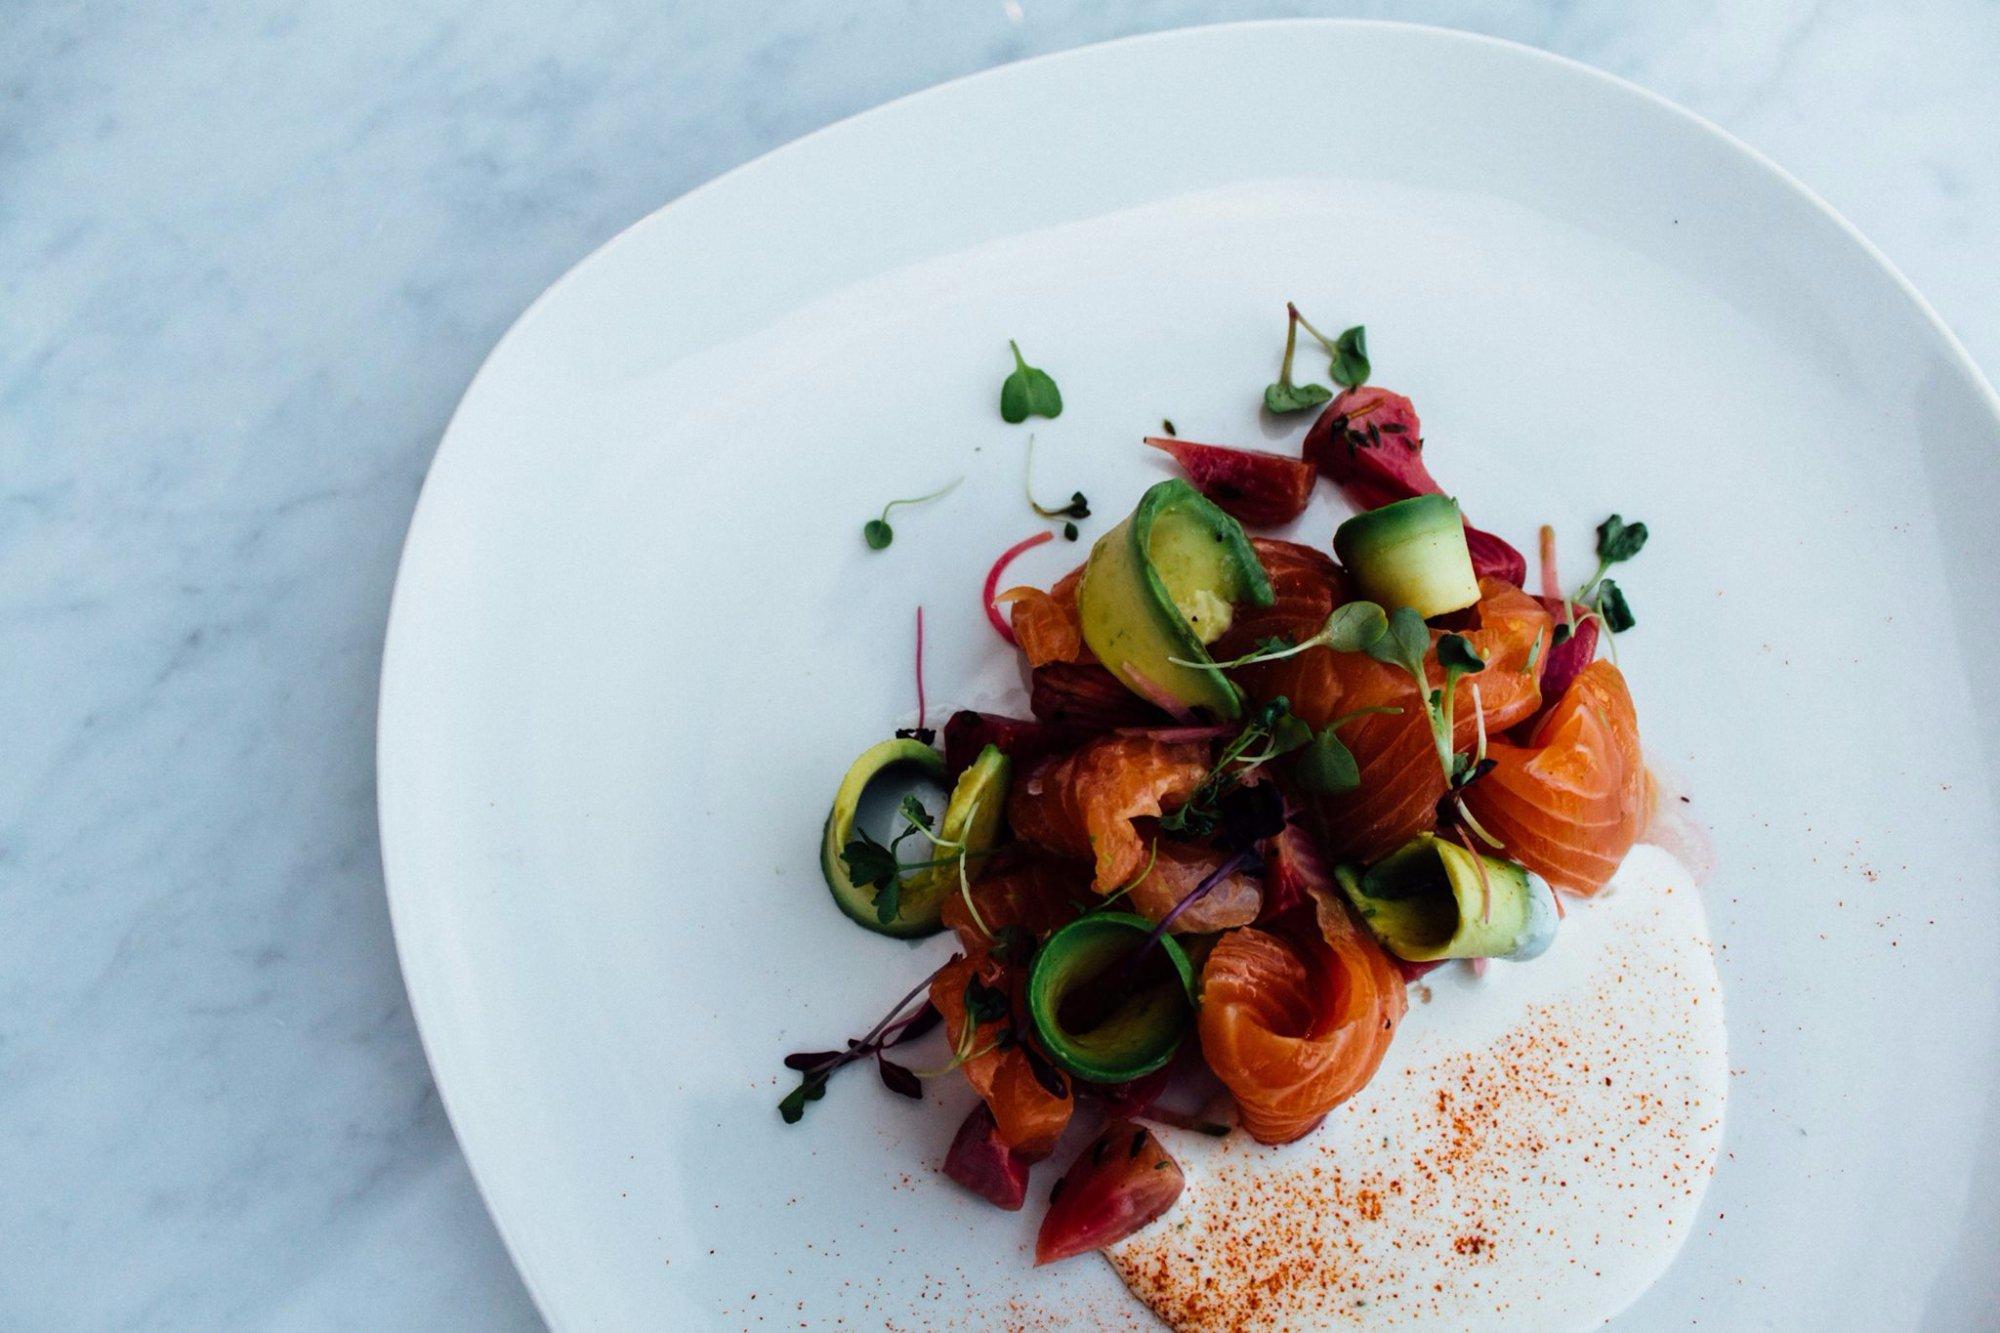 The 10 Best Restaurants Near W Scottsdale - TripAdvisor